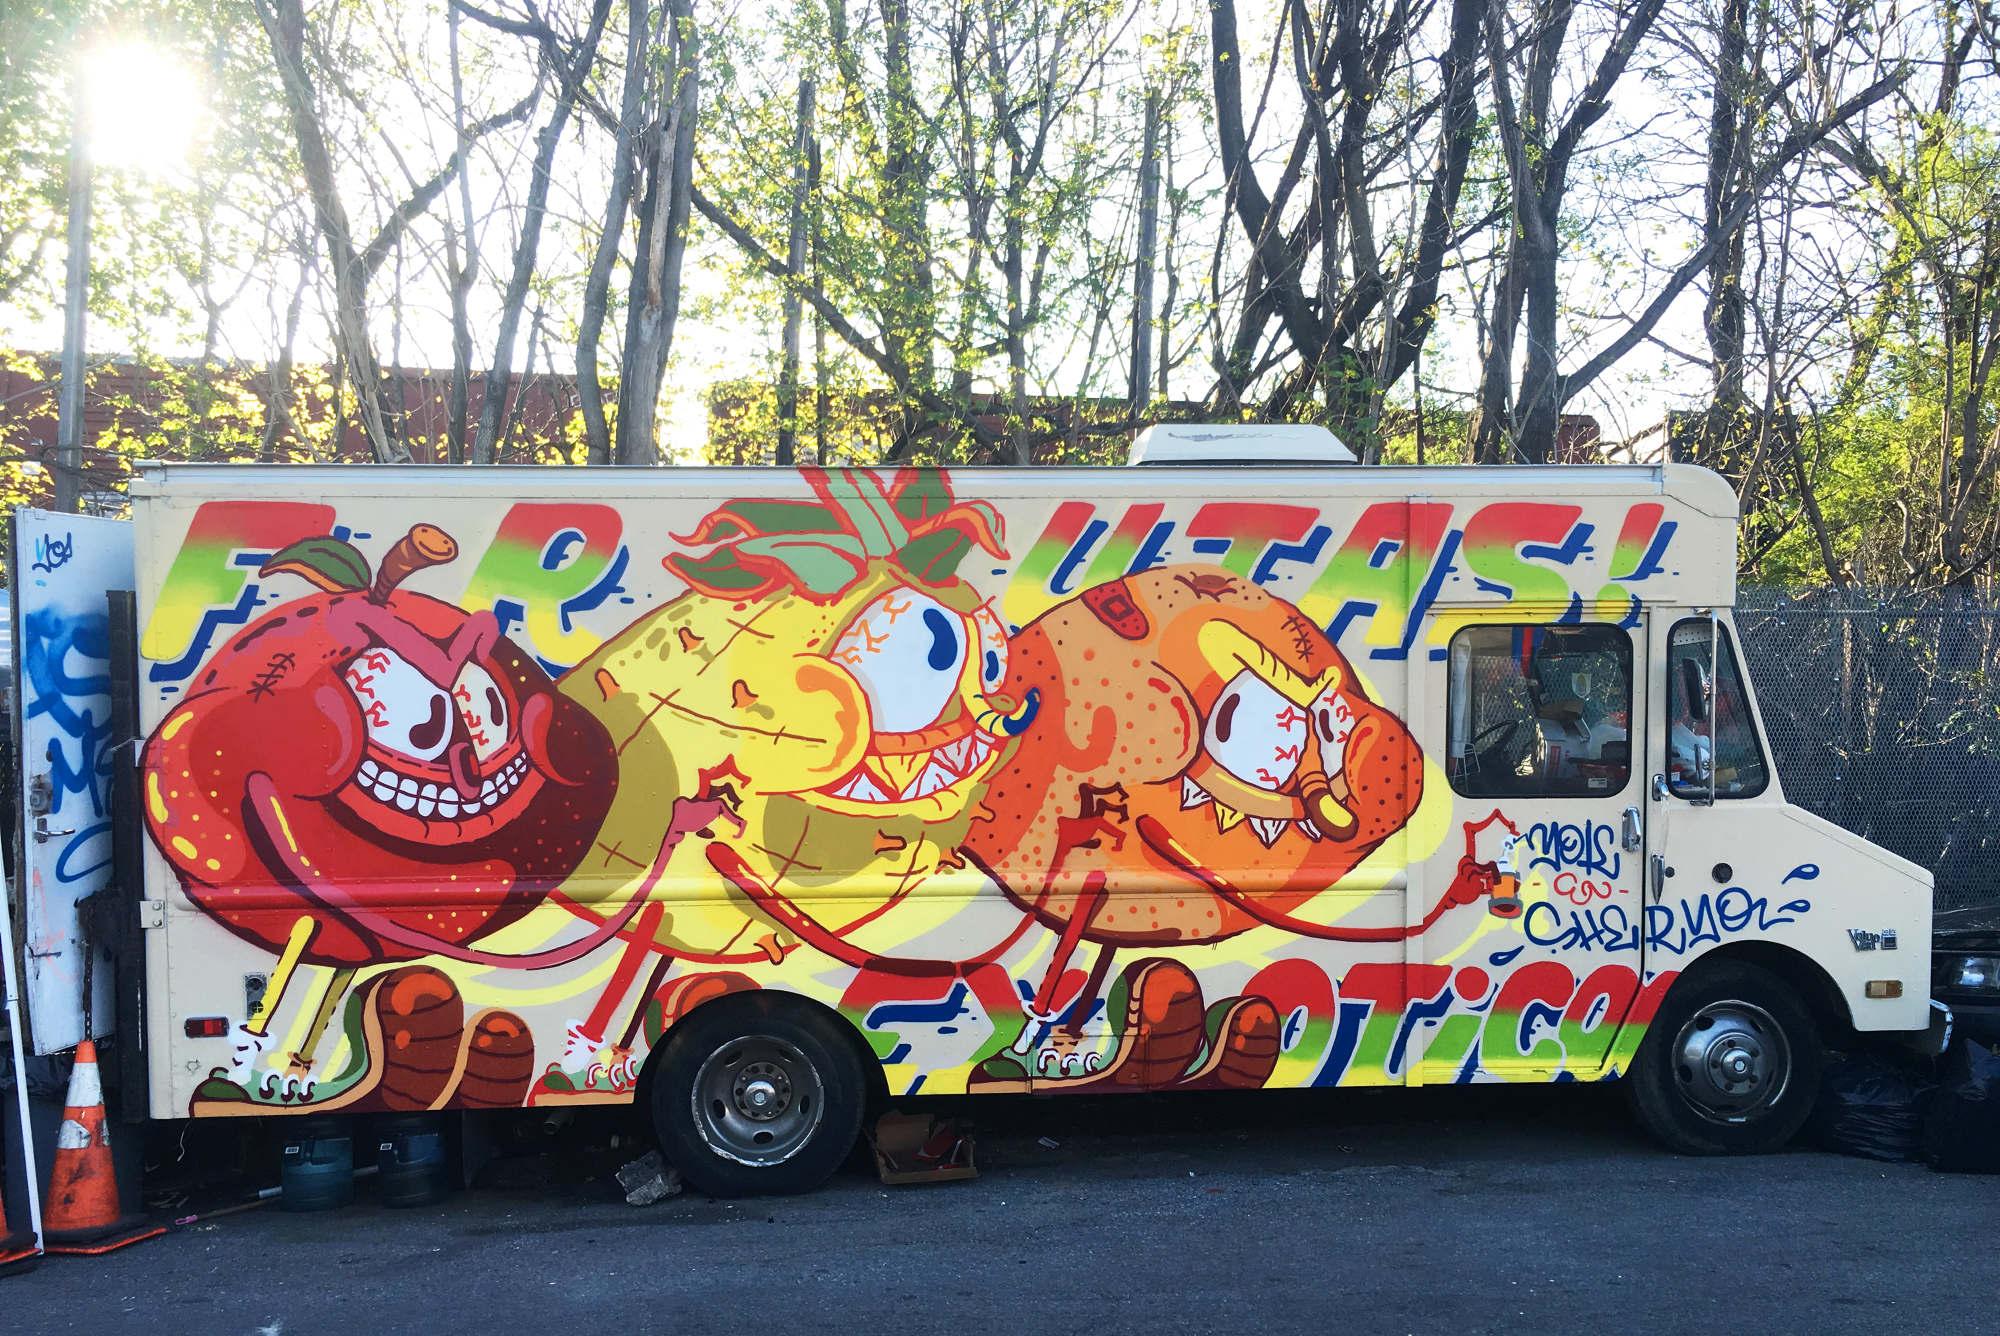 yok-sheryo-graffiti-cartoon-skateboard-5